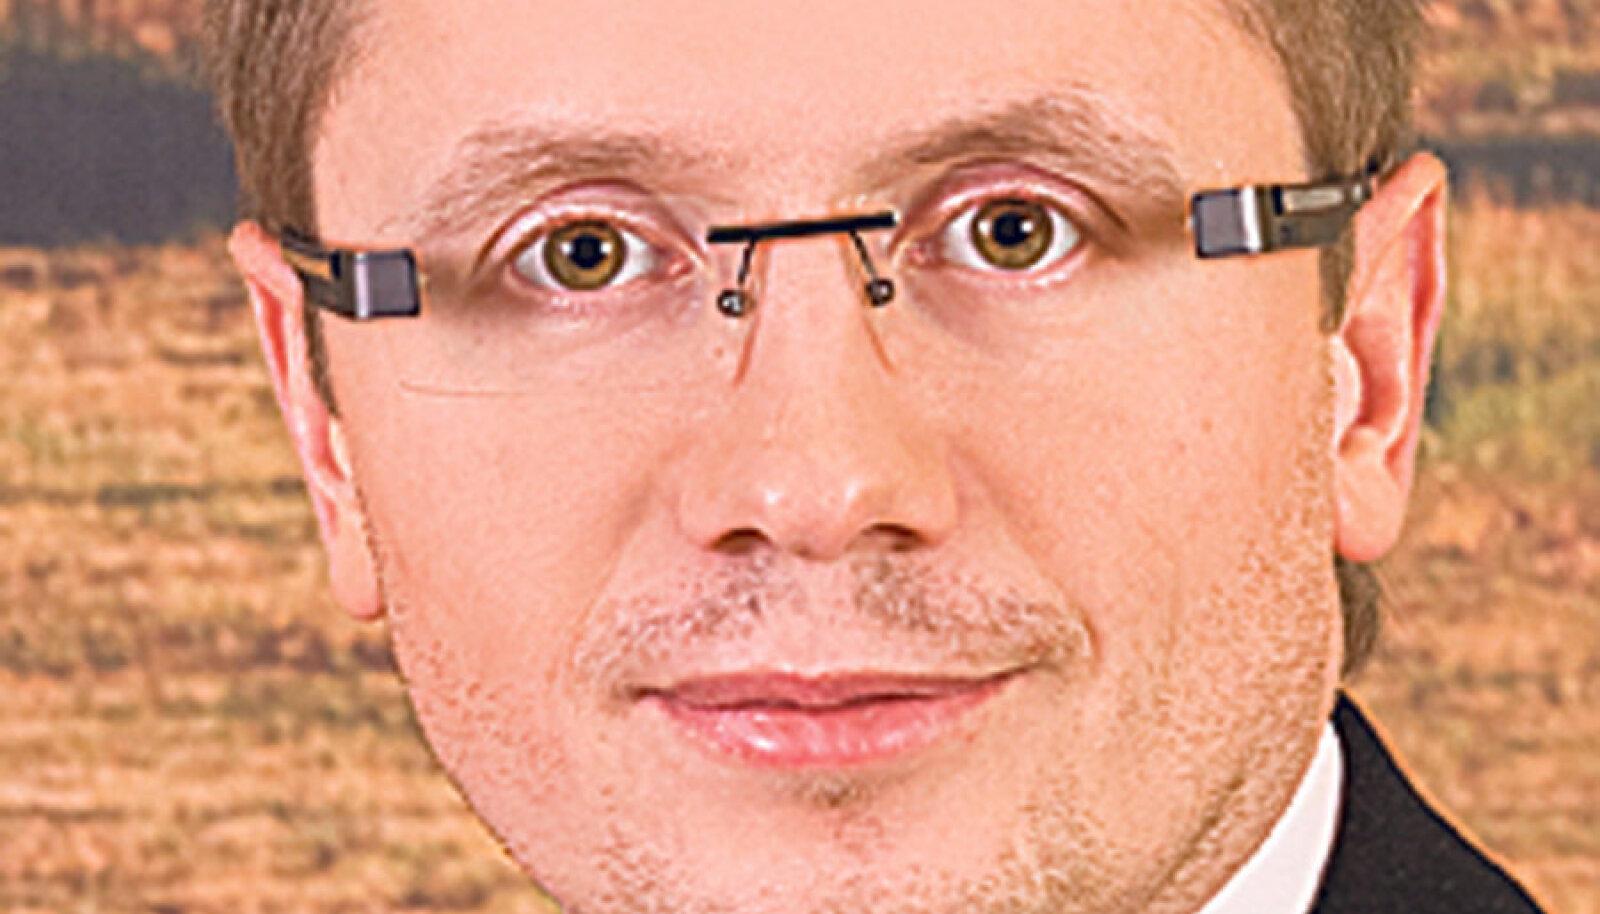 Marko Gorban